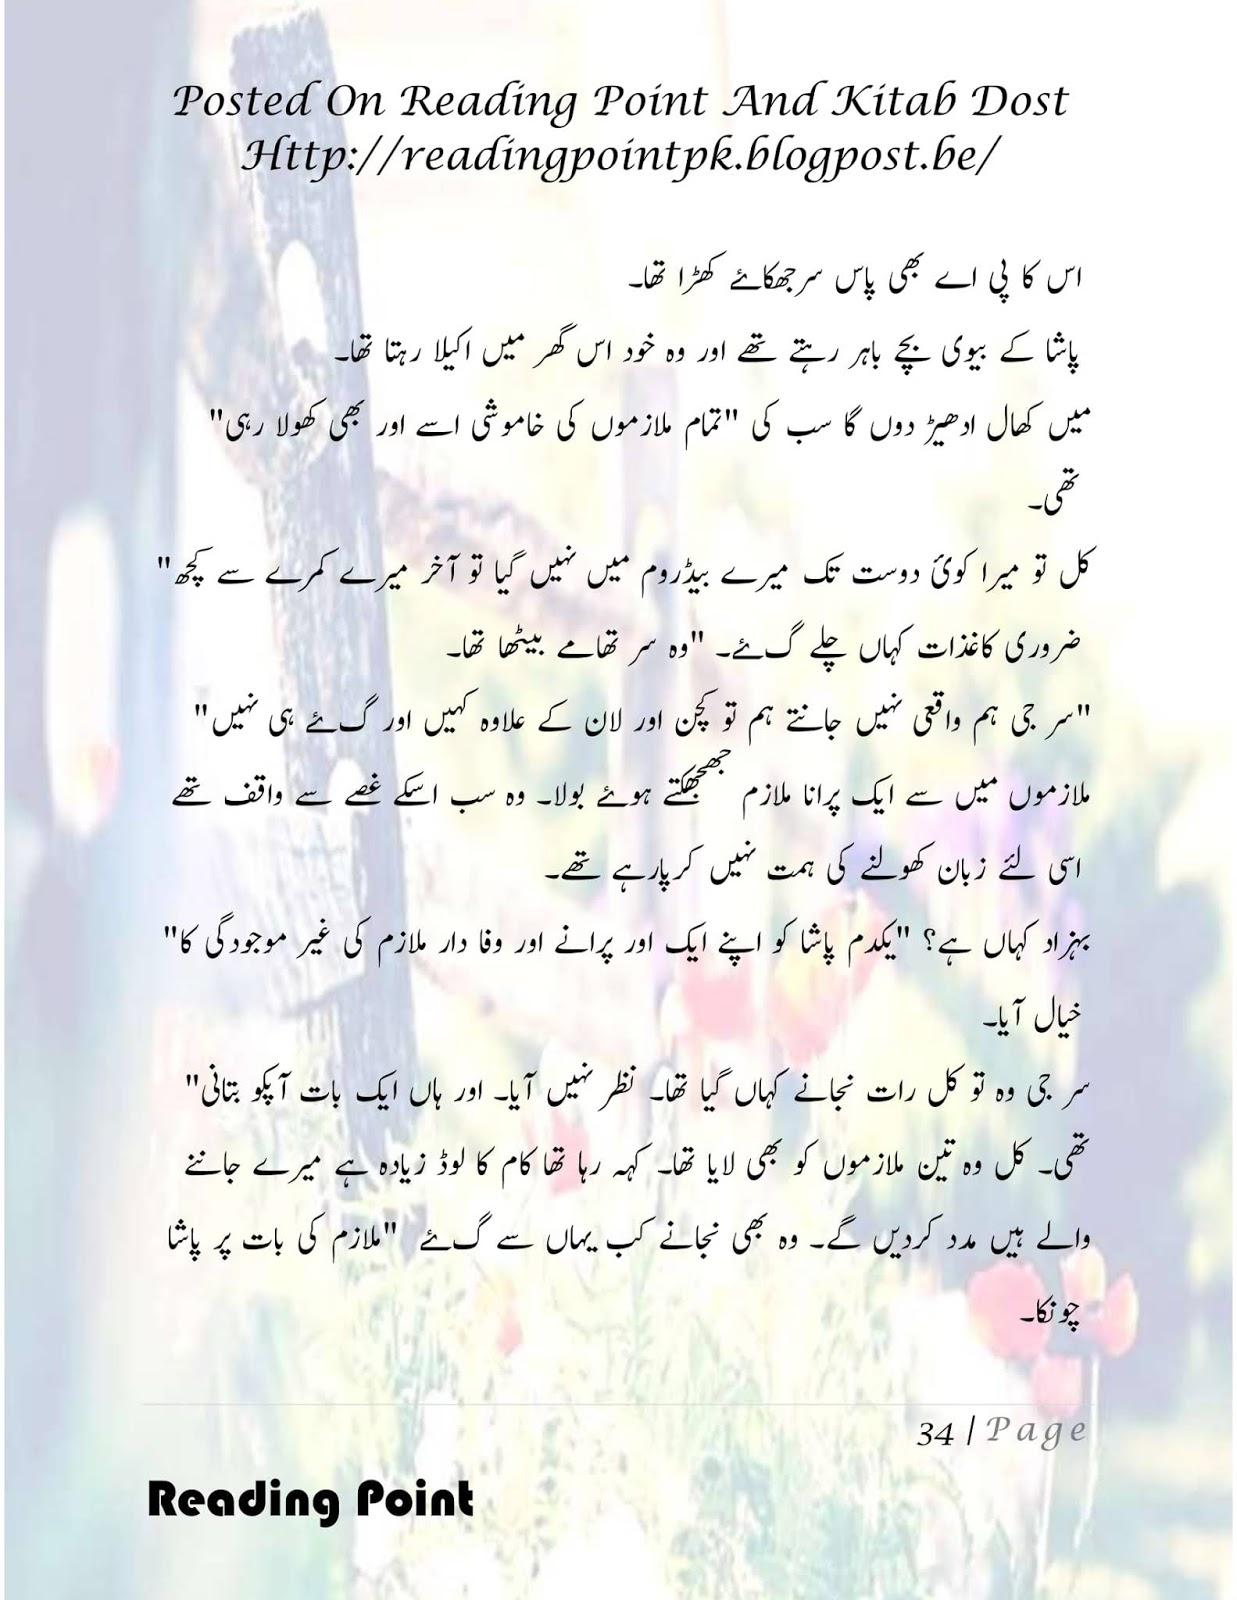 Novels by ana ilyas | Kitab Dost: Mohabbat ke jugnoo by Ana